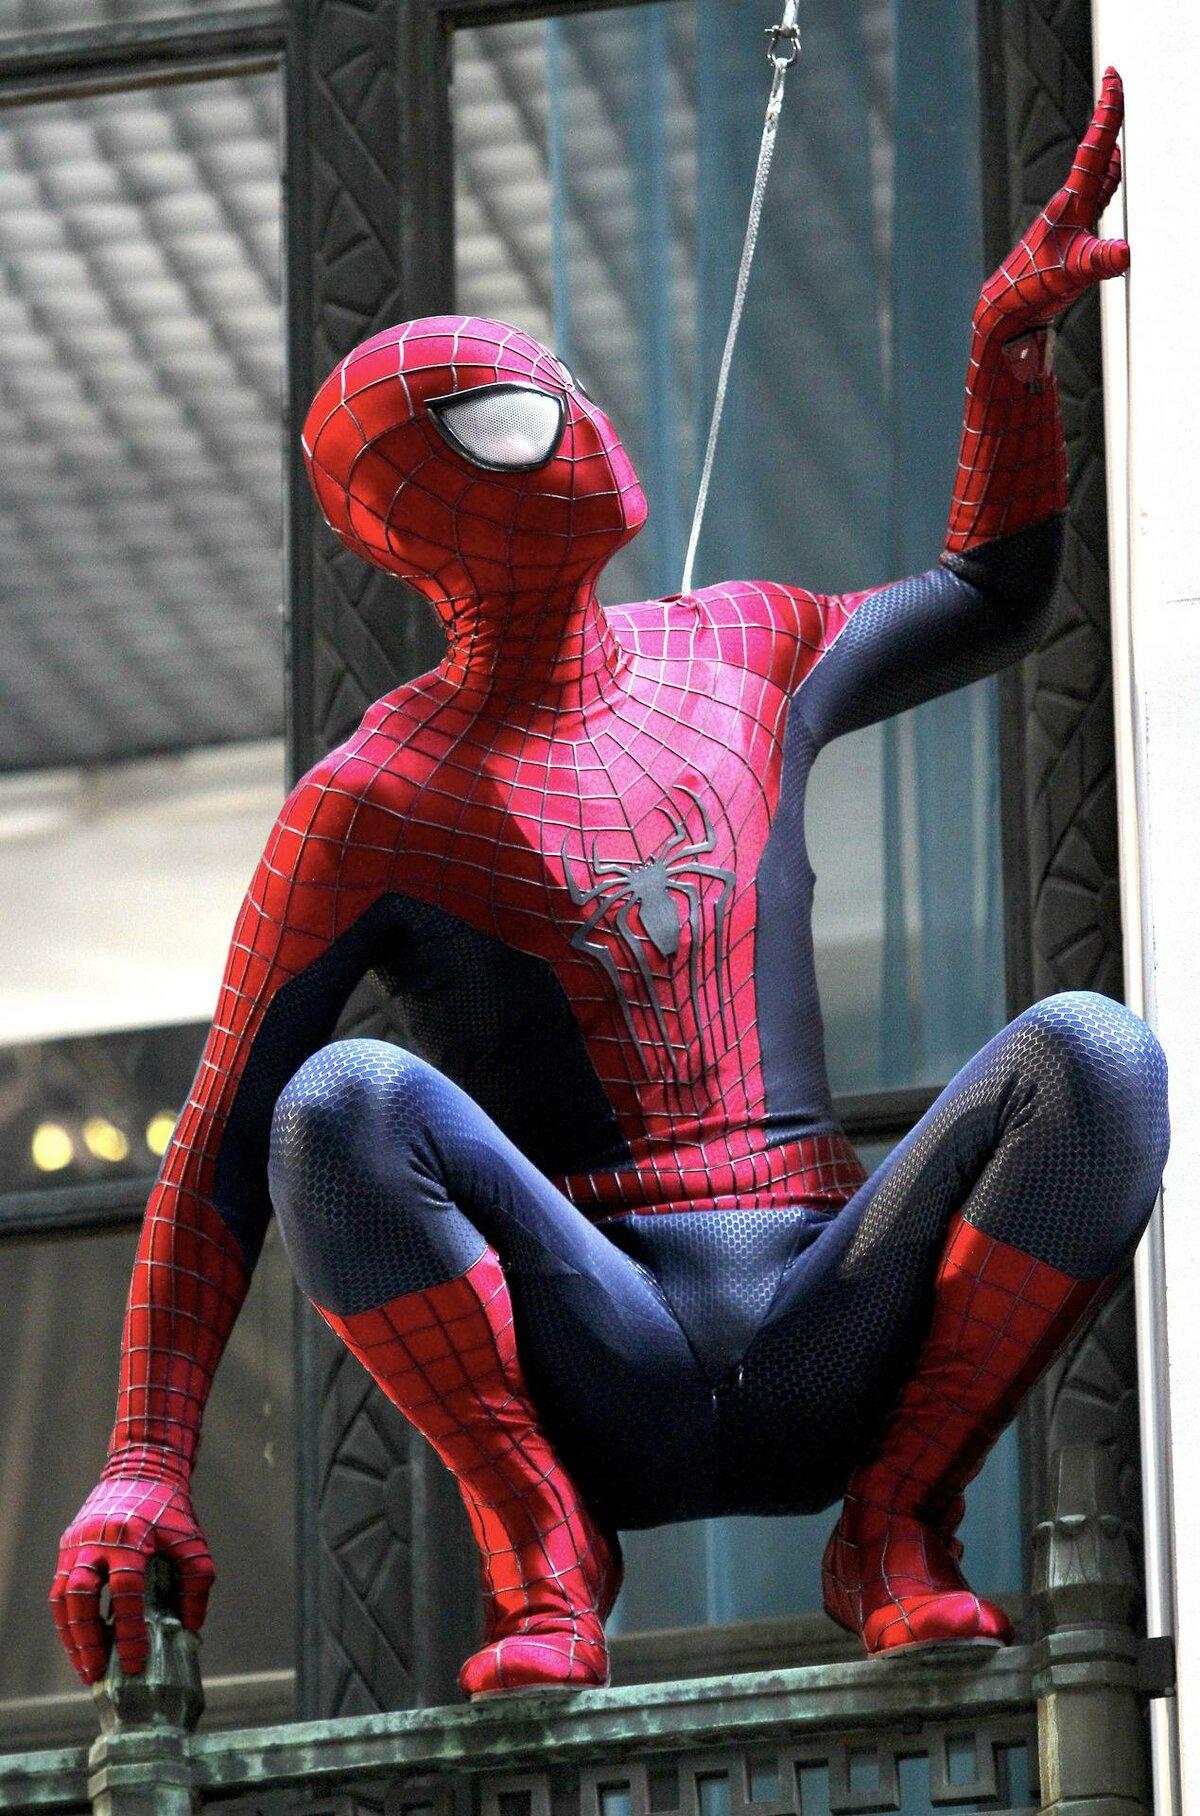 много фото человека паука противники объединились против